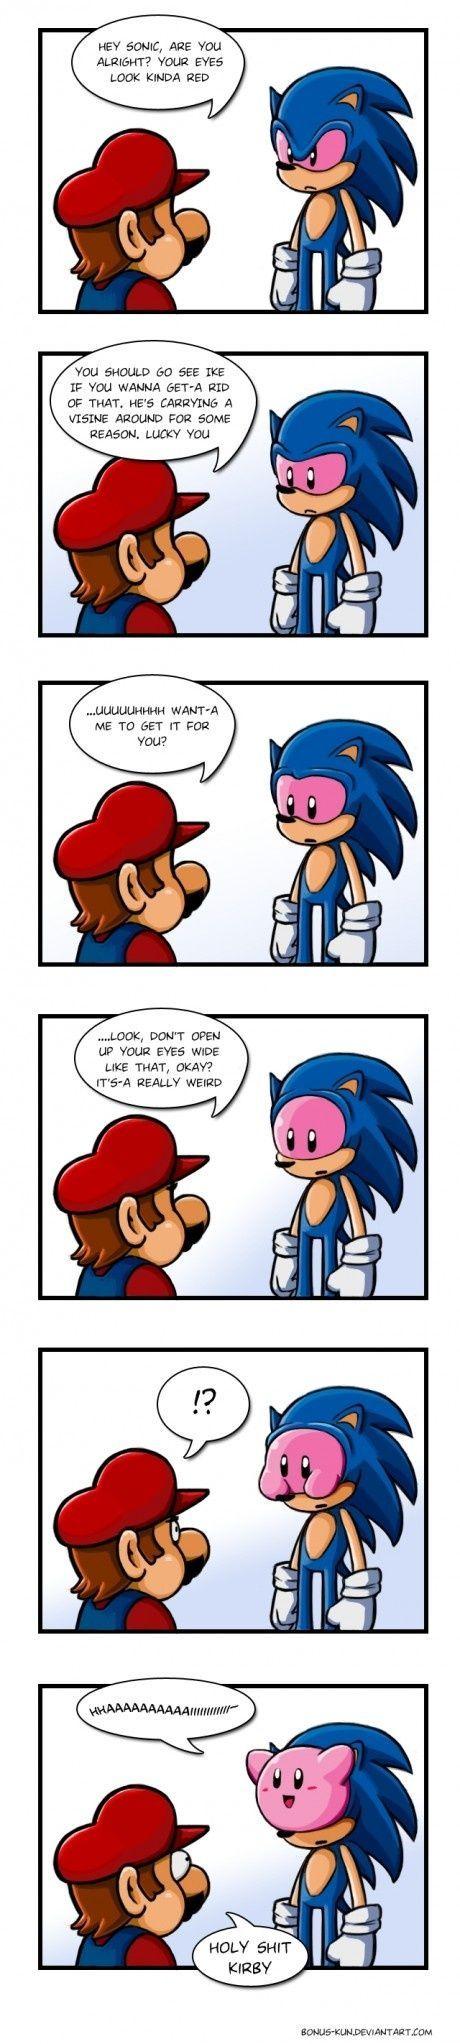 Sonics jeninfektion | Sjove billeder | Pinterest | Comic ... Funny Videos